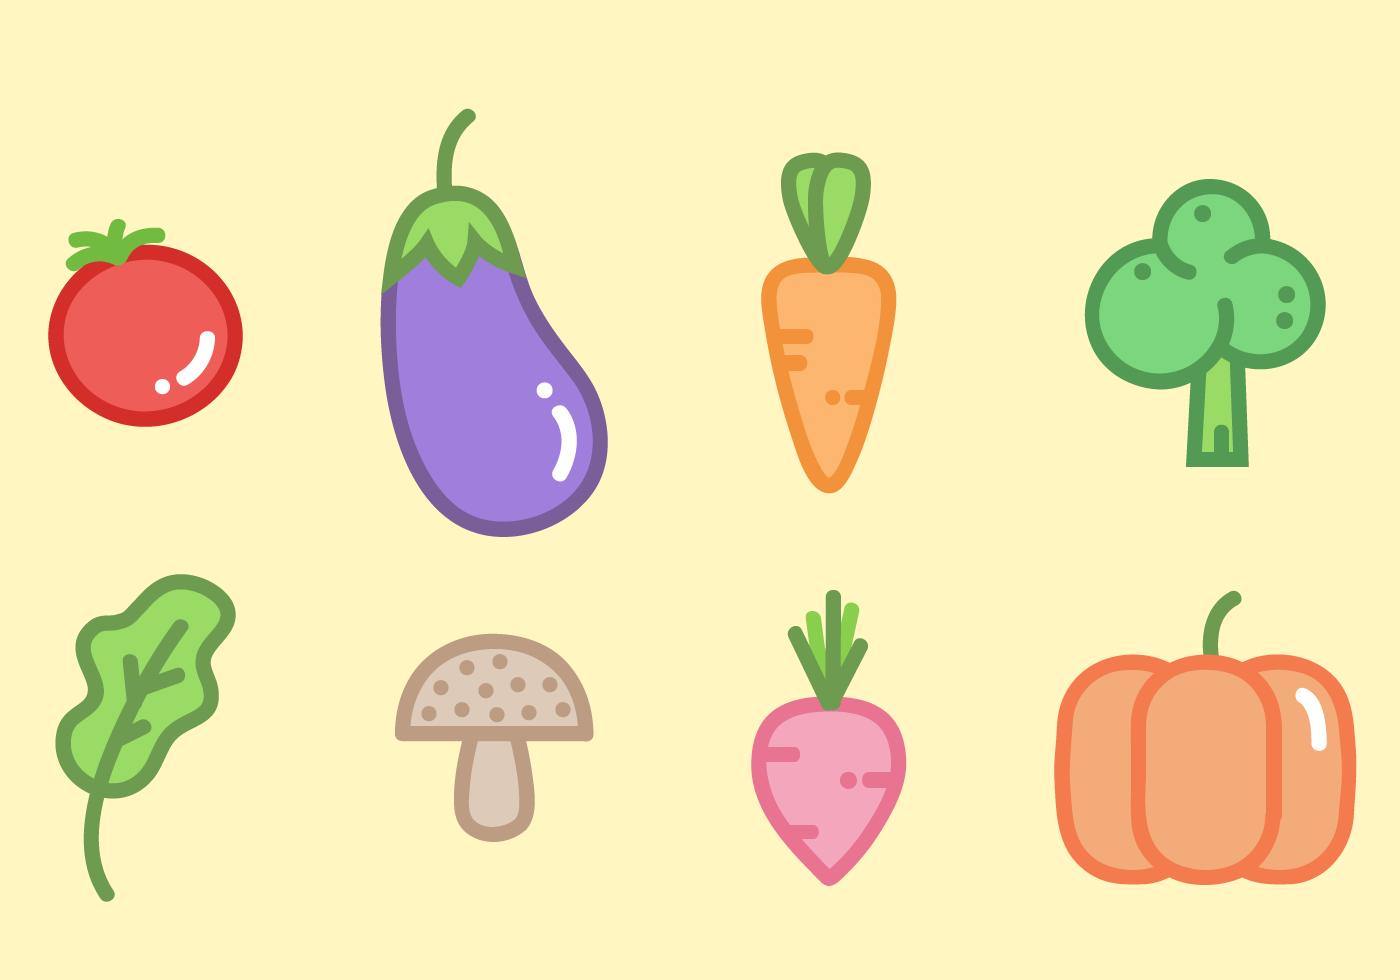 Free Vegetable Vector - Download Free Vector Art, Stock ...